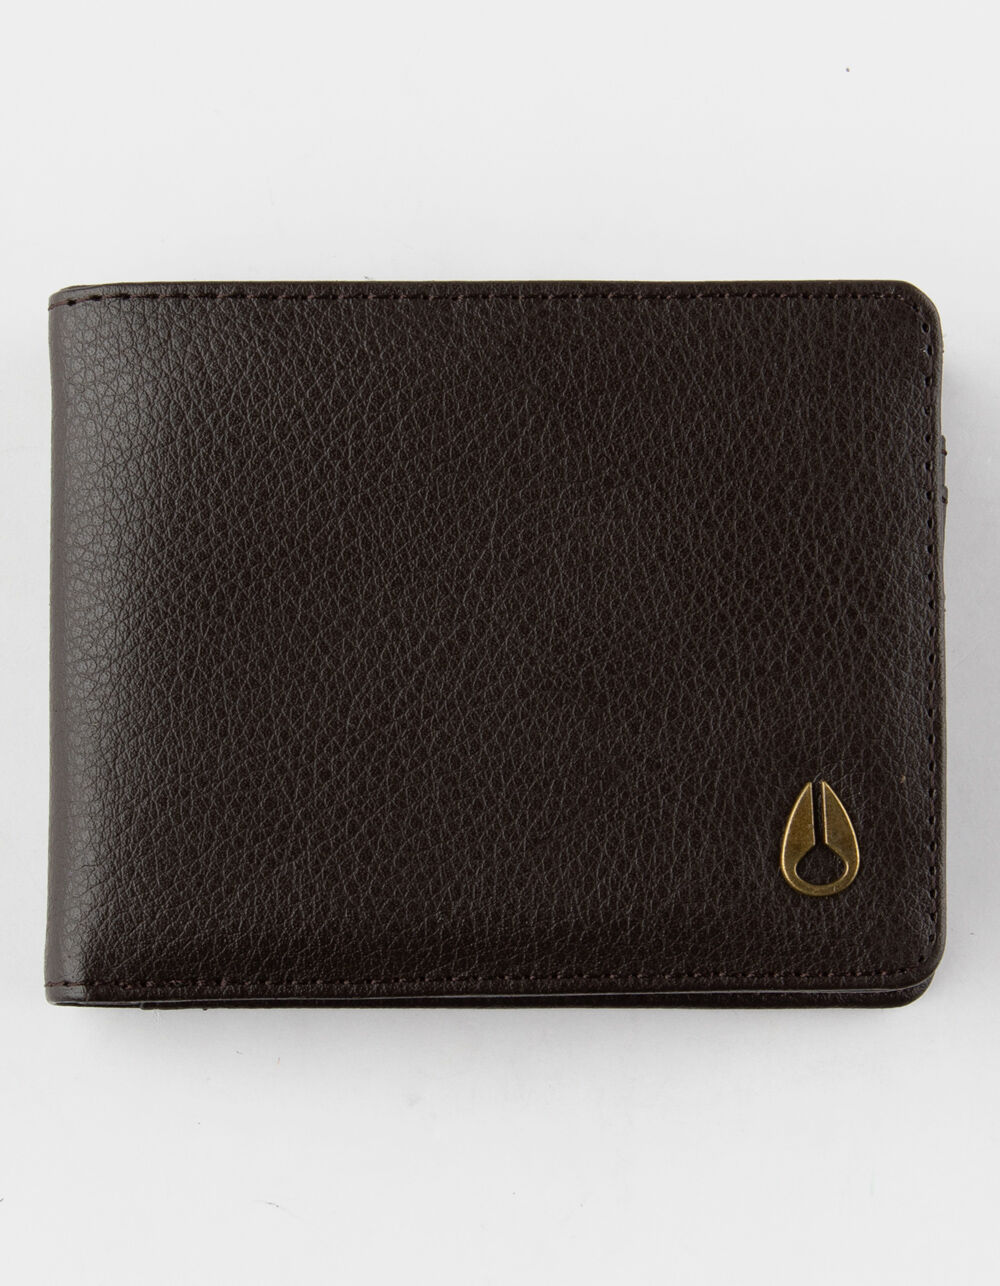 NIXON Cape Vegan Leather Brown Wallet